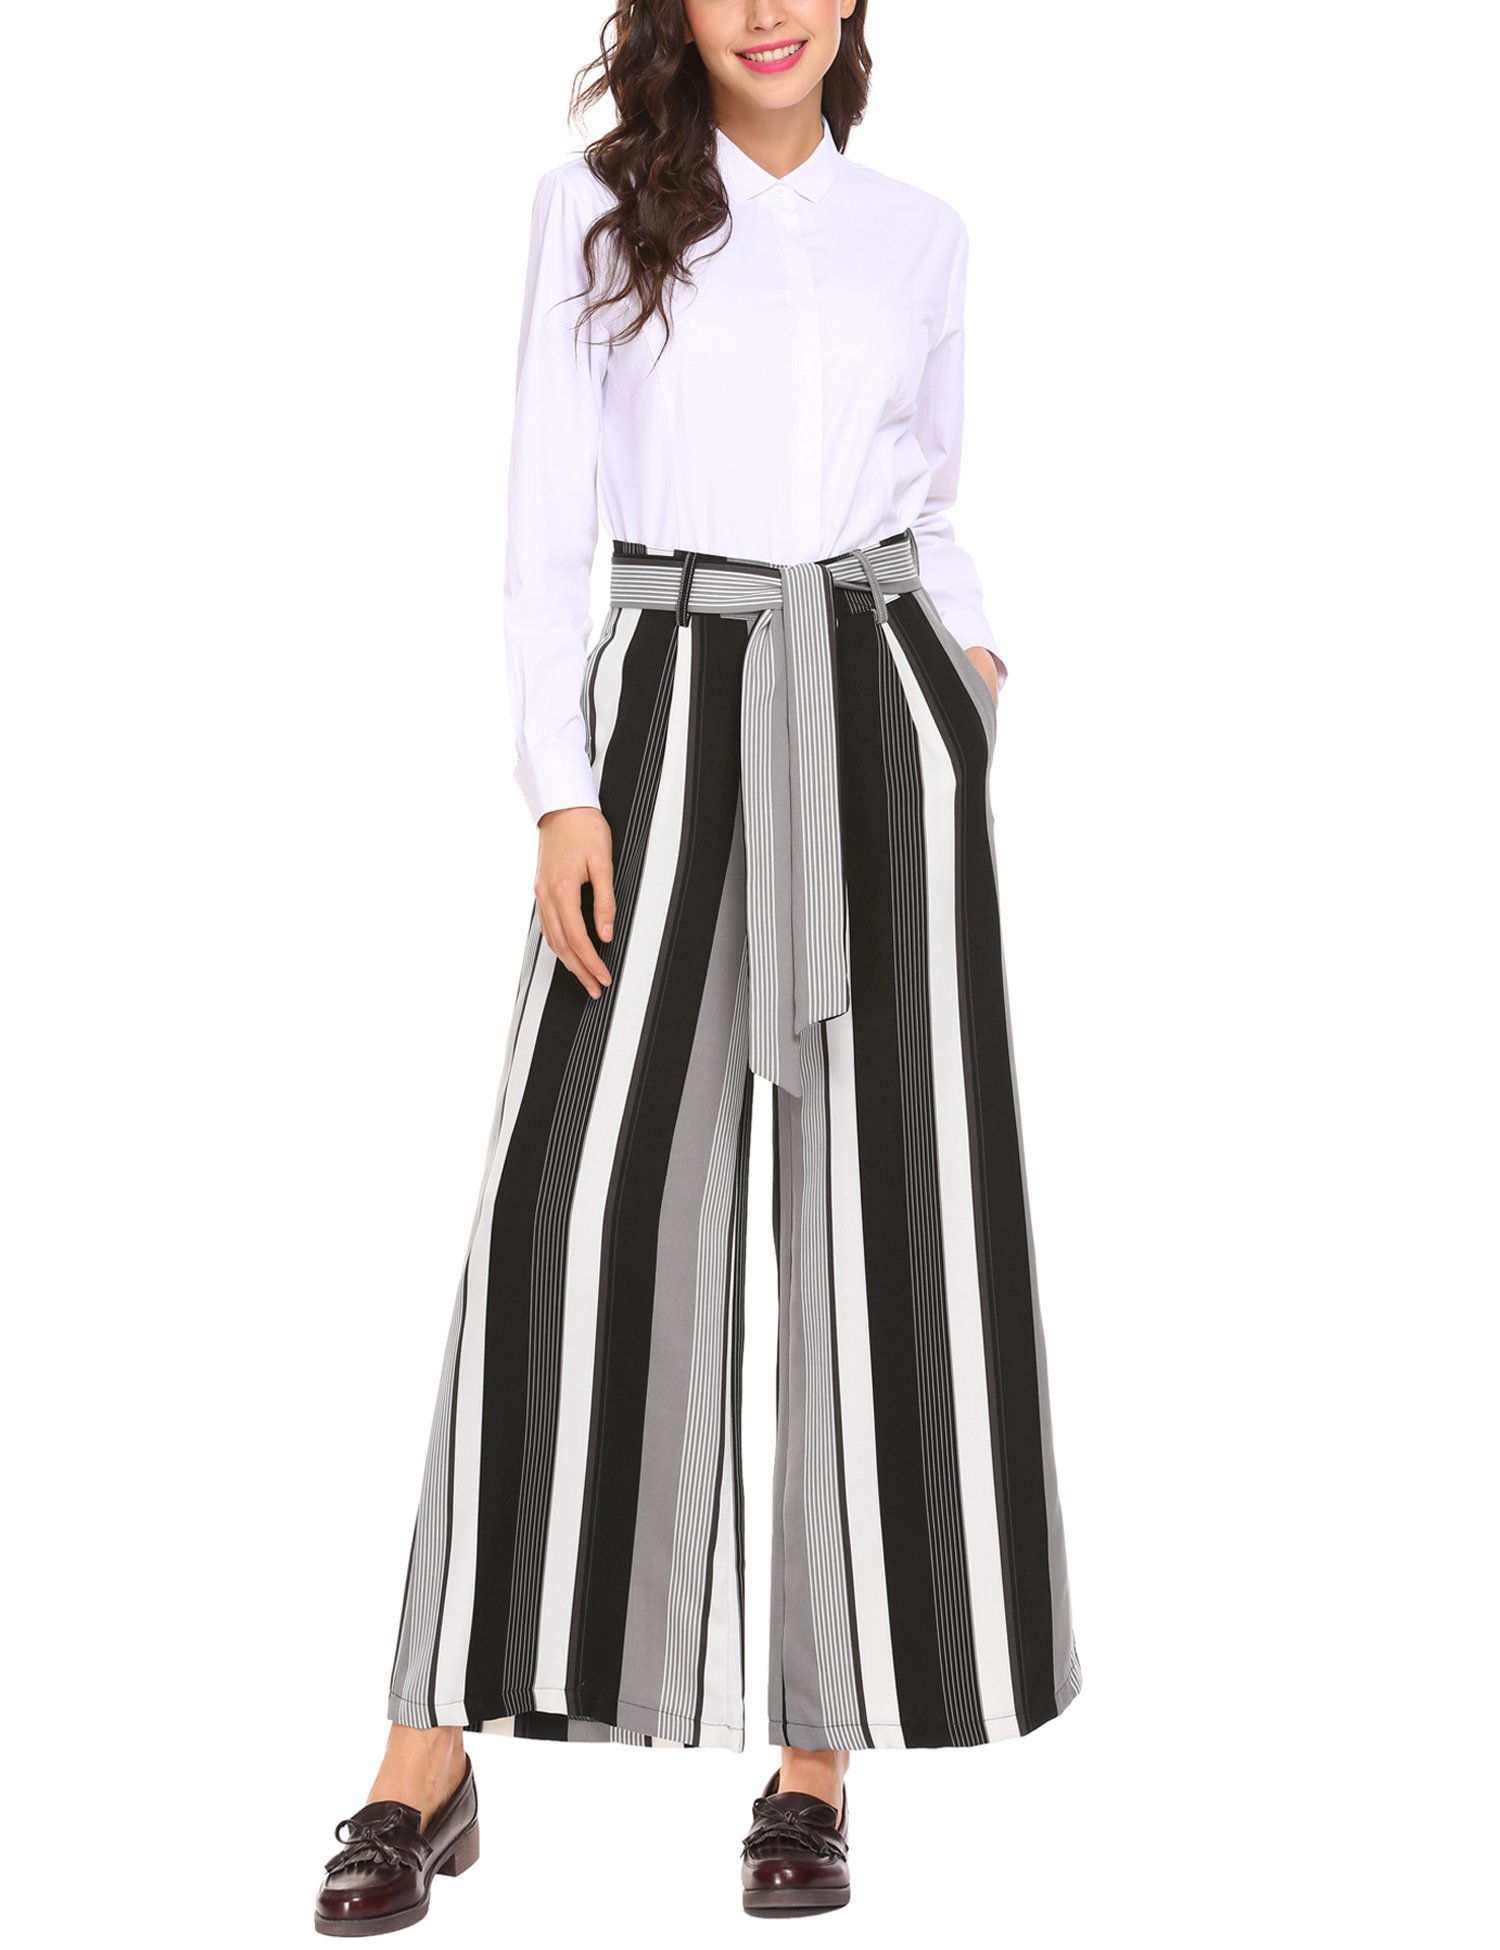 Zeagoo Women's Stripe Flowy Wide Leg High Waist Belted Palazzo Pants Capris,Black Print,Medium